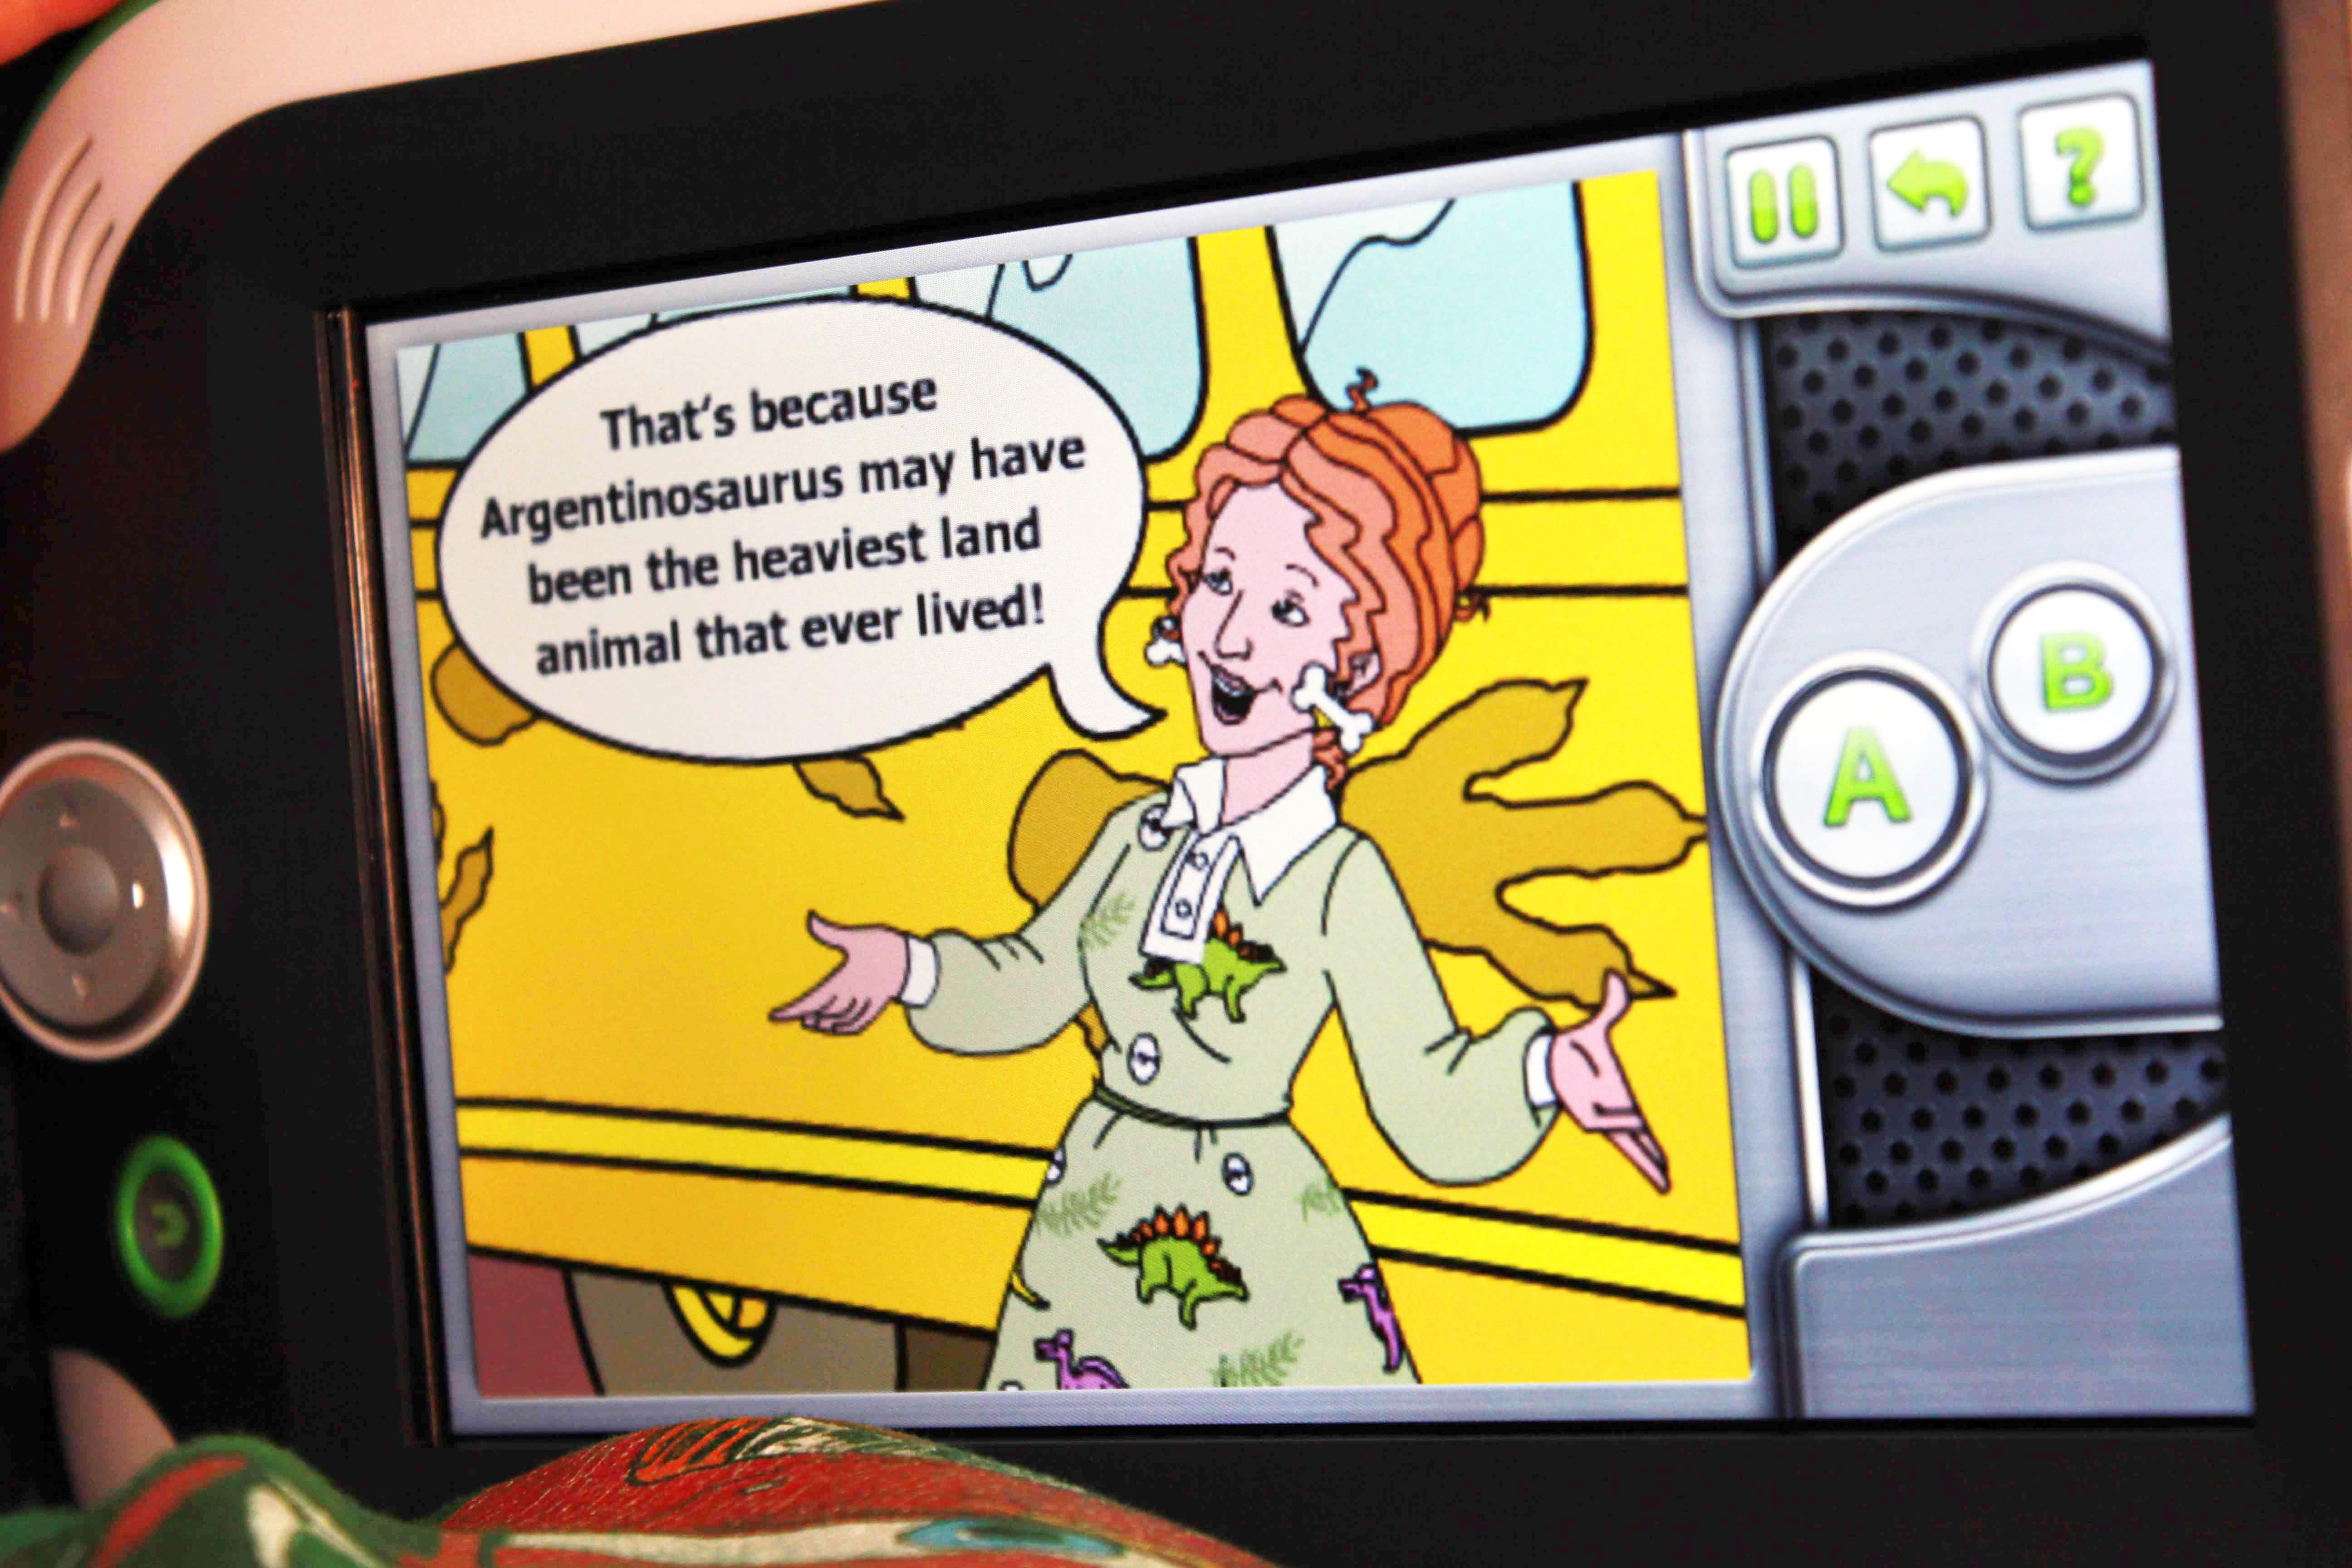 Magic School Bus Dinosaur LeapPad Game Facts